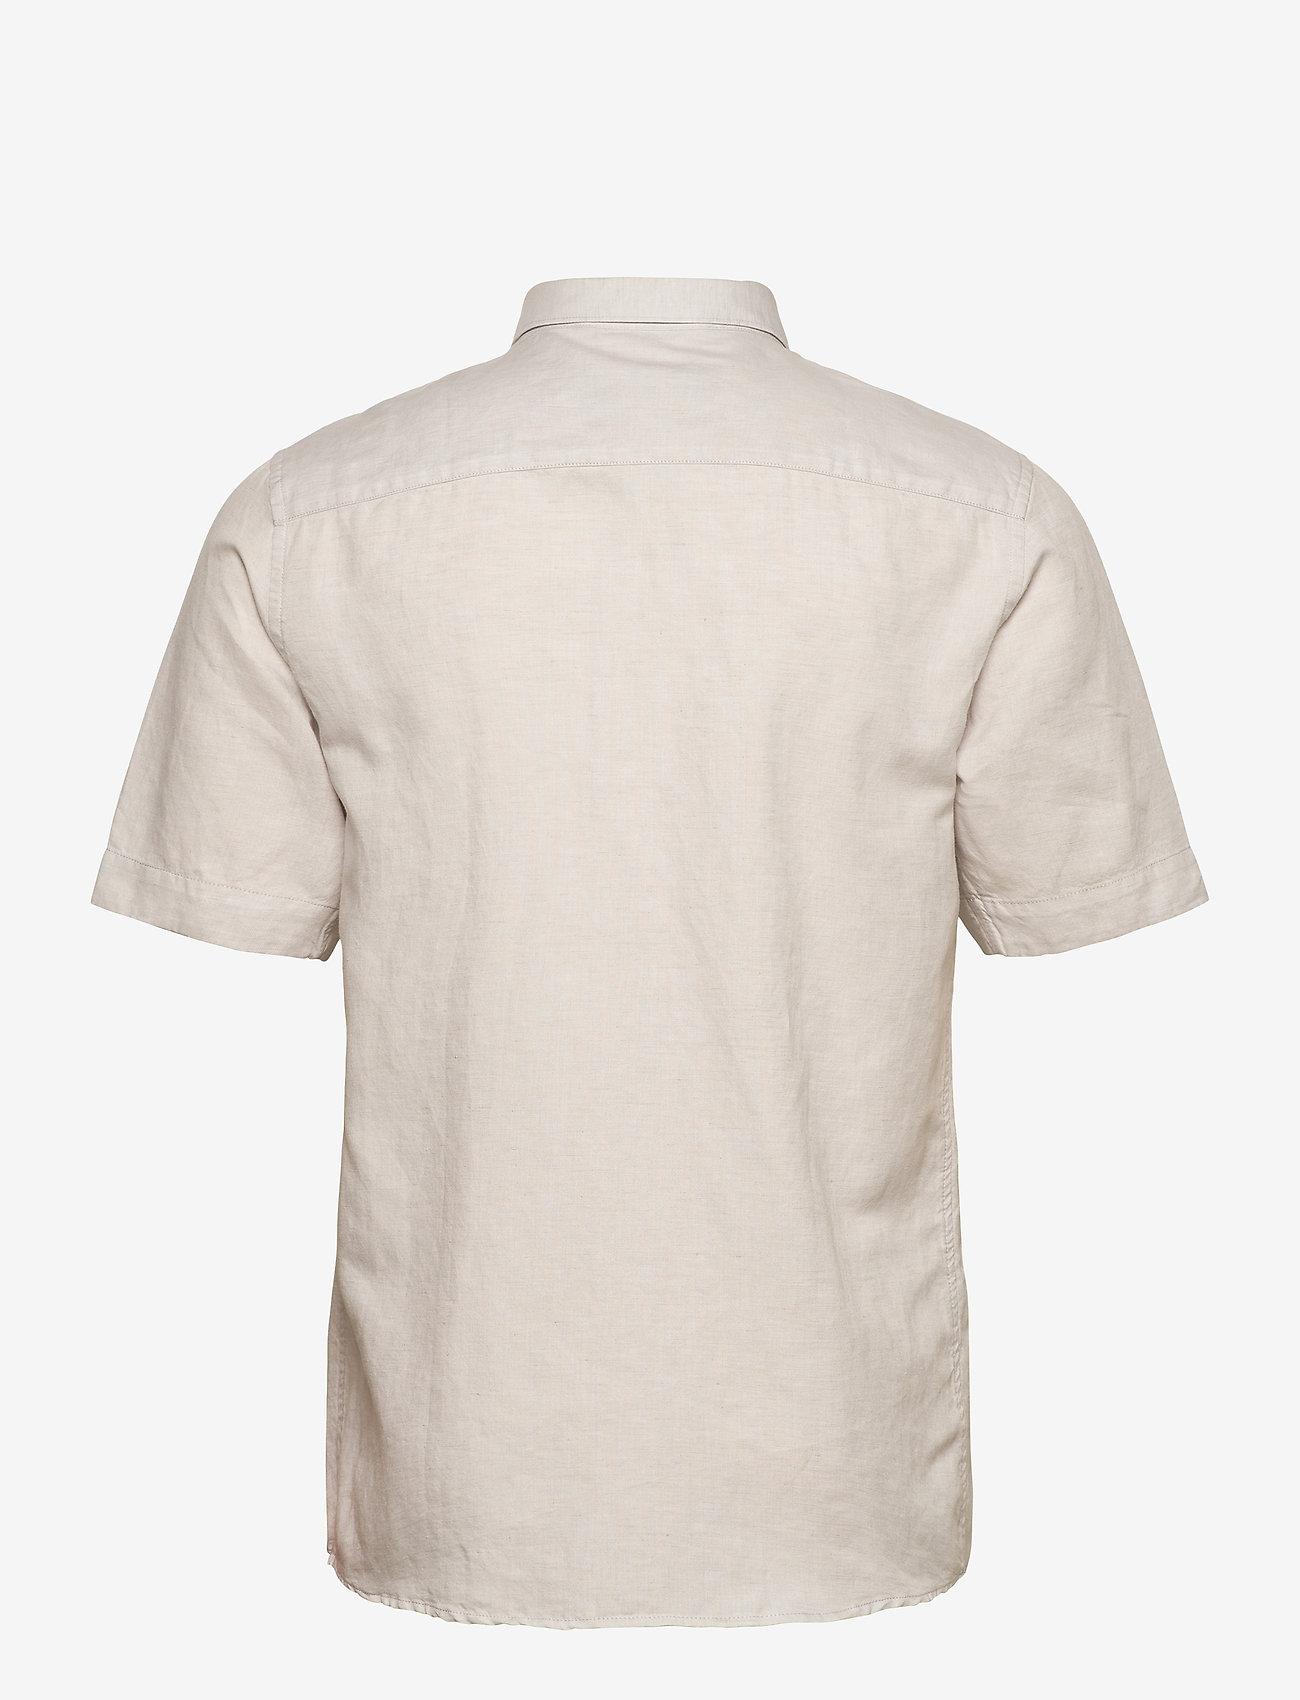 Peak Performance - DEAN LISSS - t-shirts - antarctica - 1